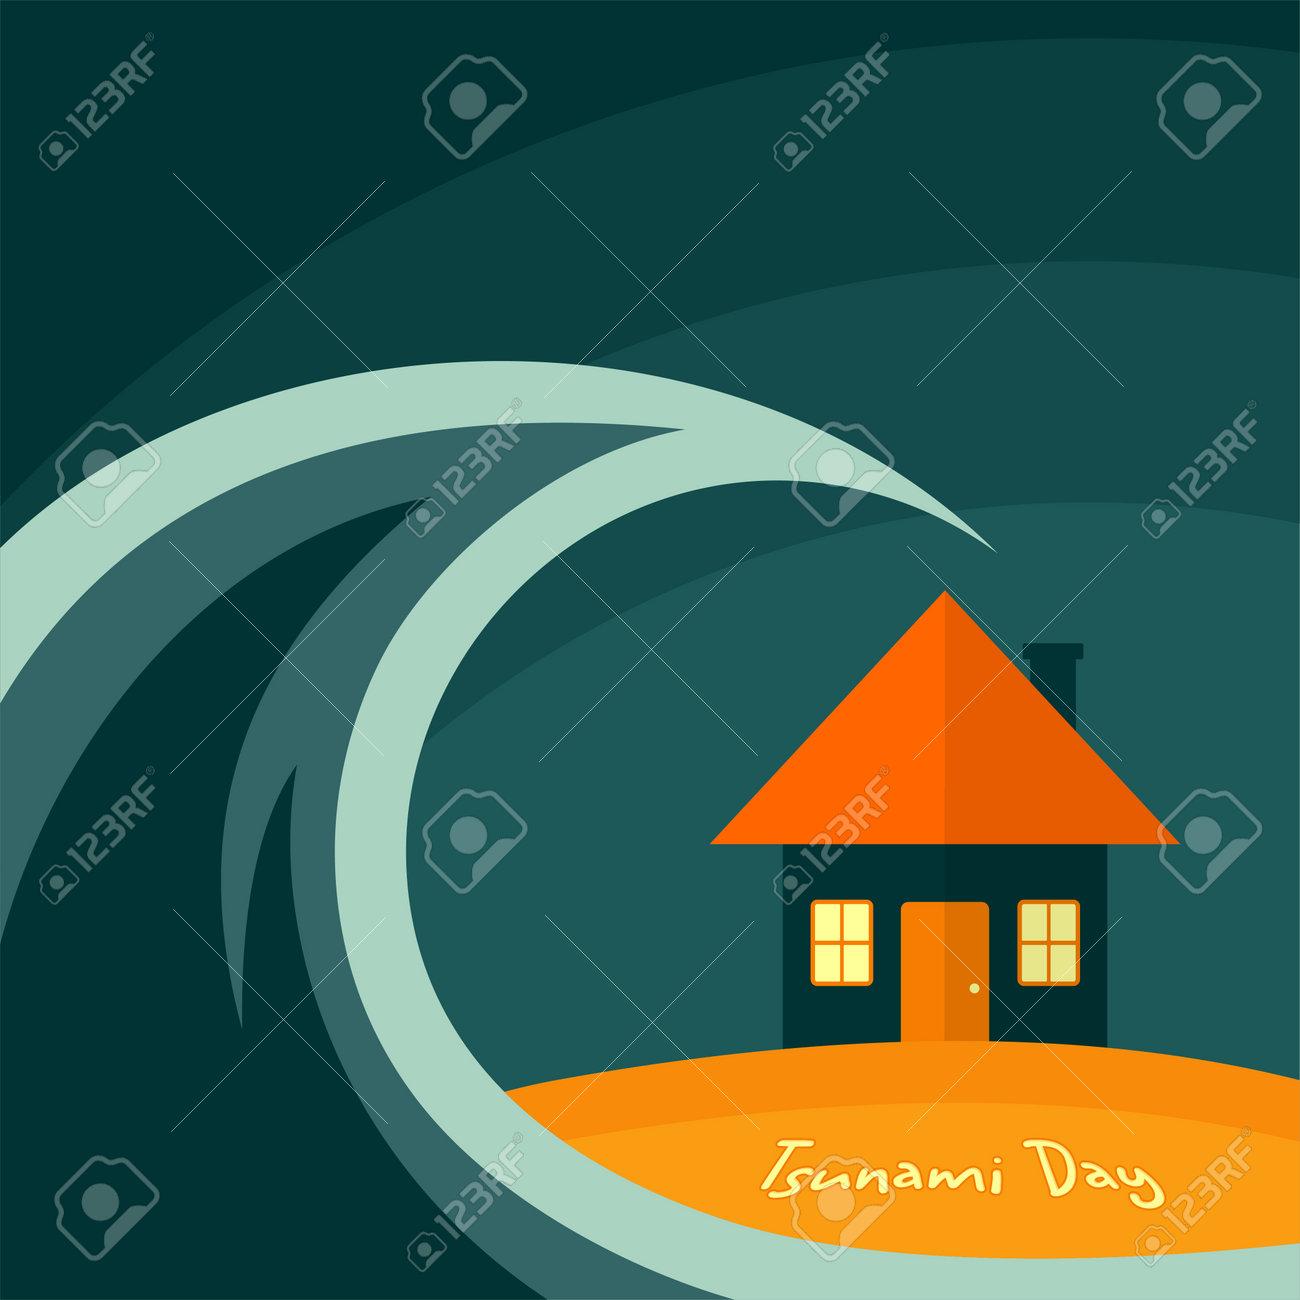 World Tsunami Day, the tsunami hit the house Vector Design - 133506295